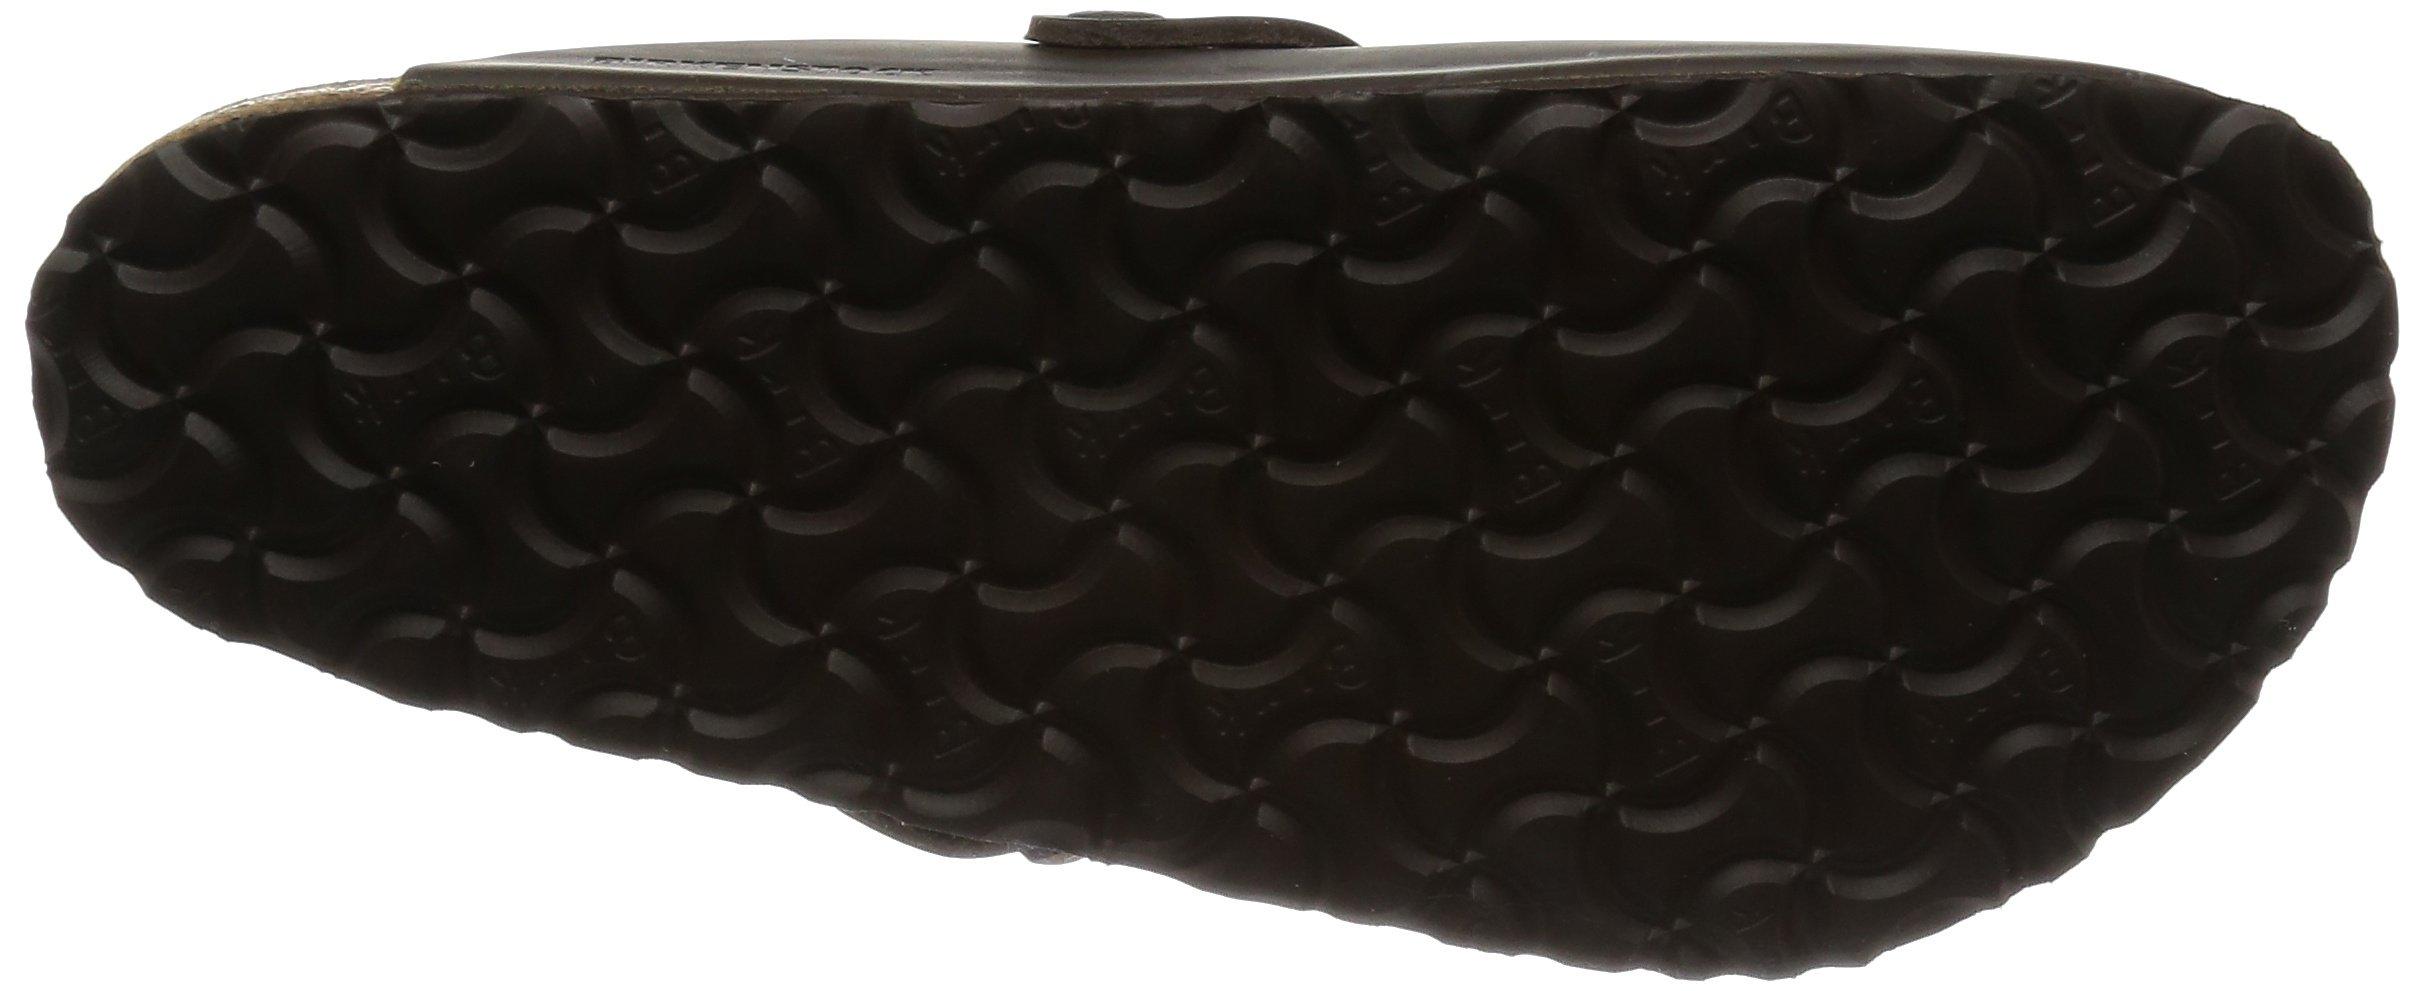 Birkenstock Boston, Unisex Adults' Clogs, Dark Brown Leather,8 UK by Birkenstock (Image #3)